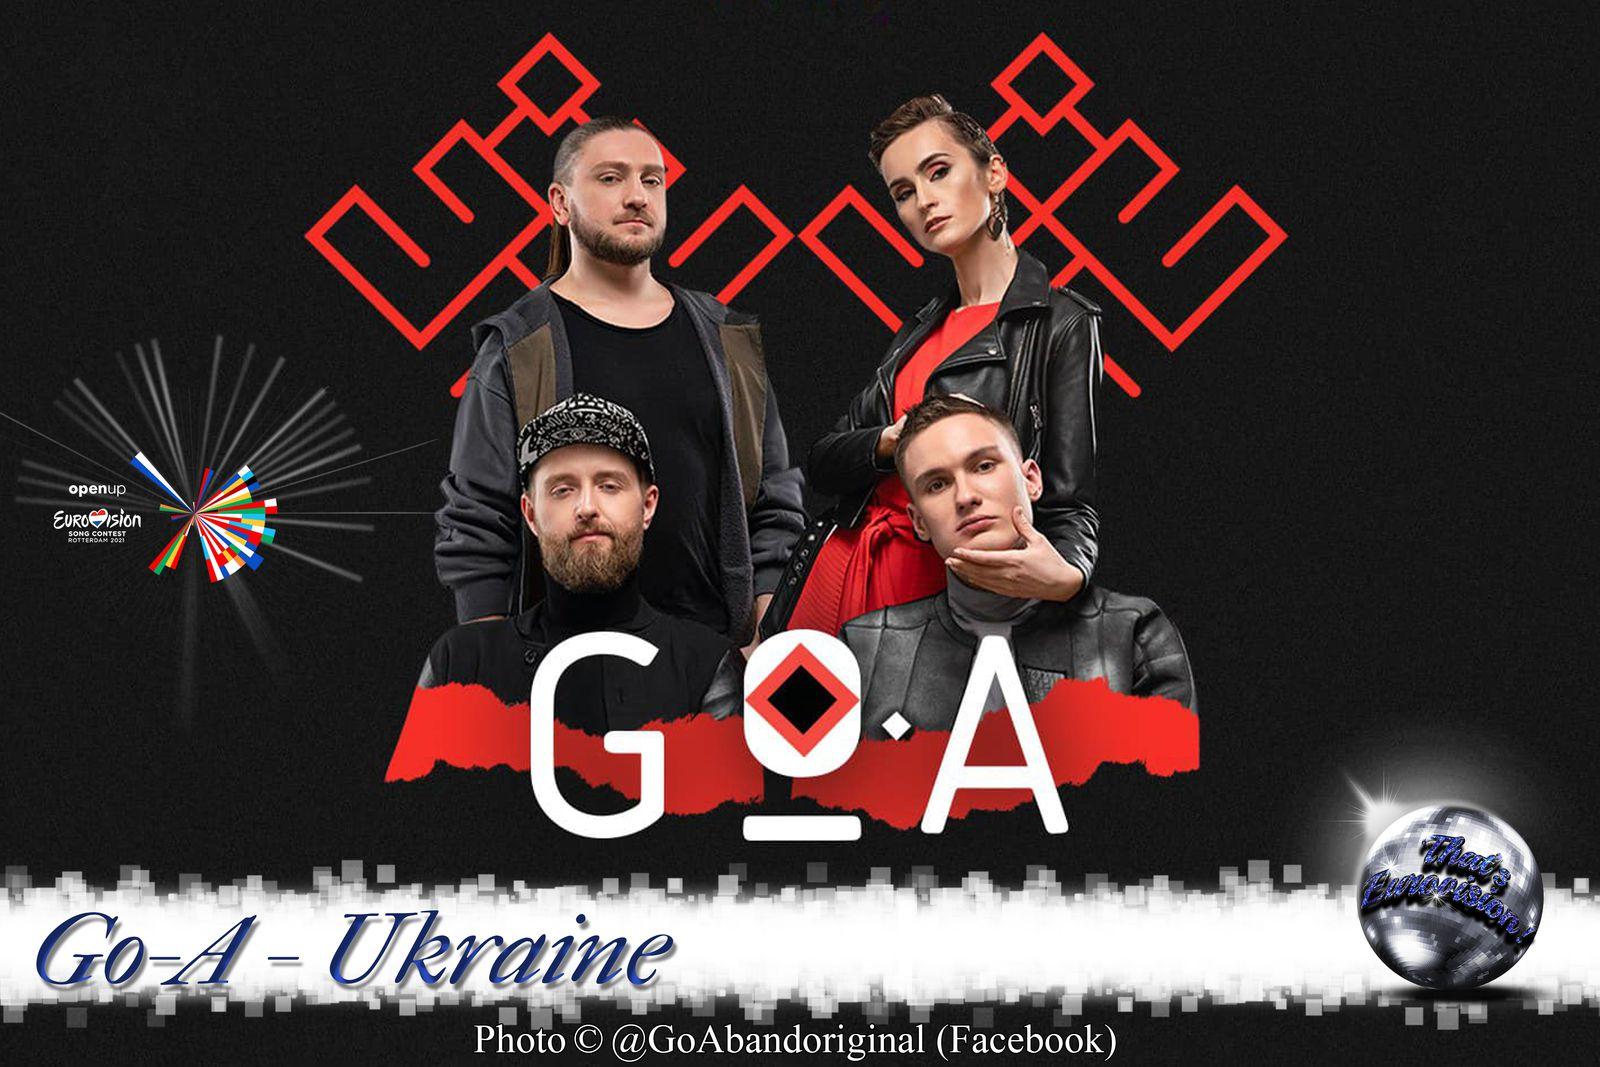 Ukraine 2021 - Go-A (Shum)